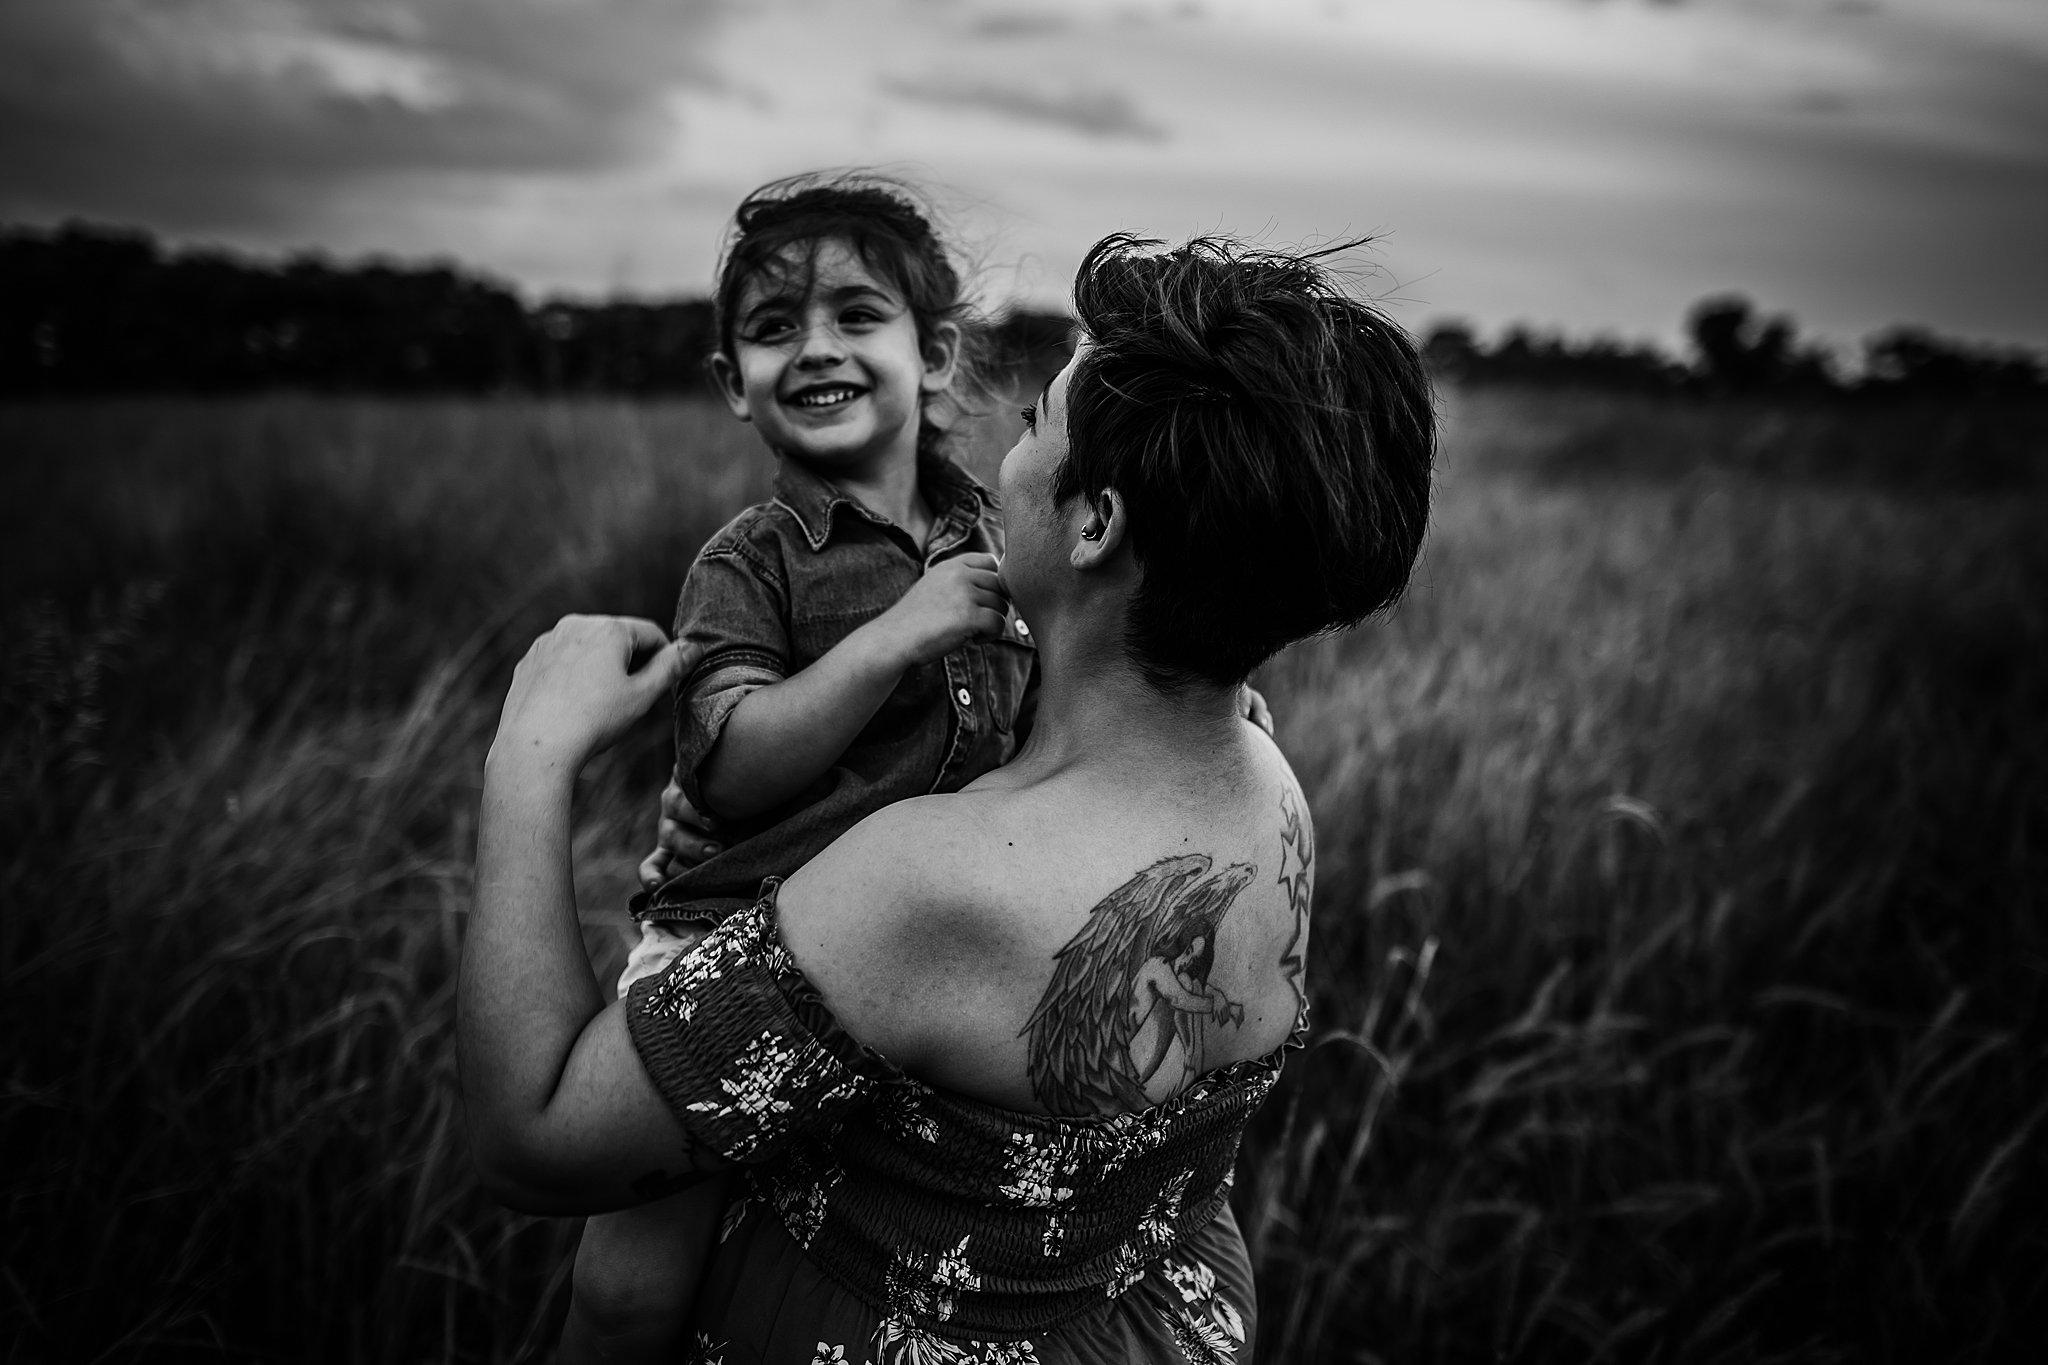 Meagan-San-Antonio-Maternity-Photographer-48_WEB.jpg